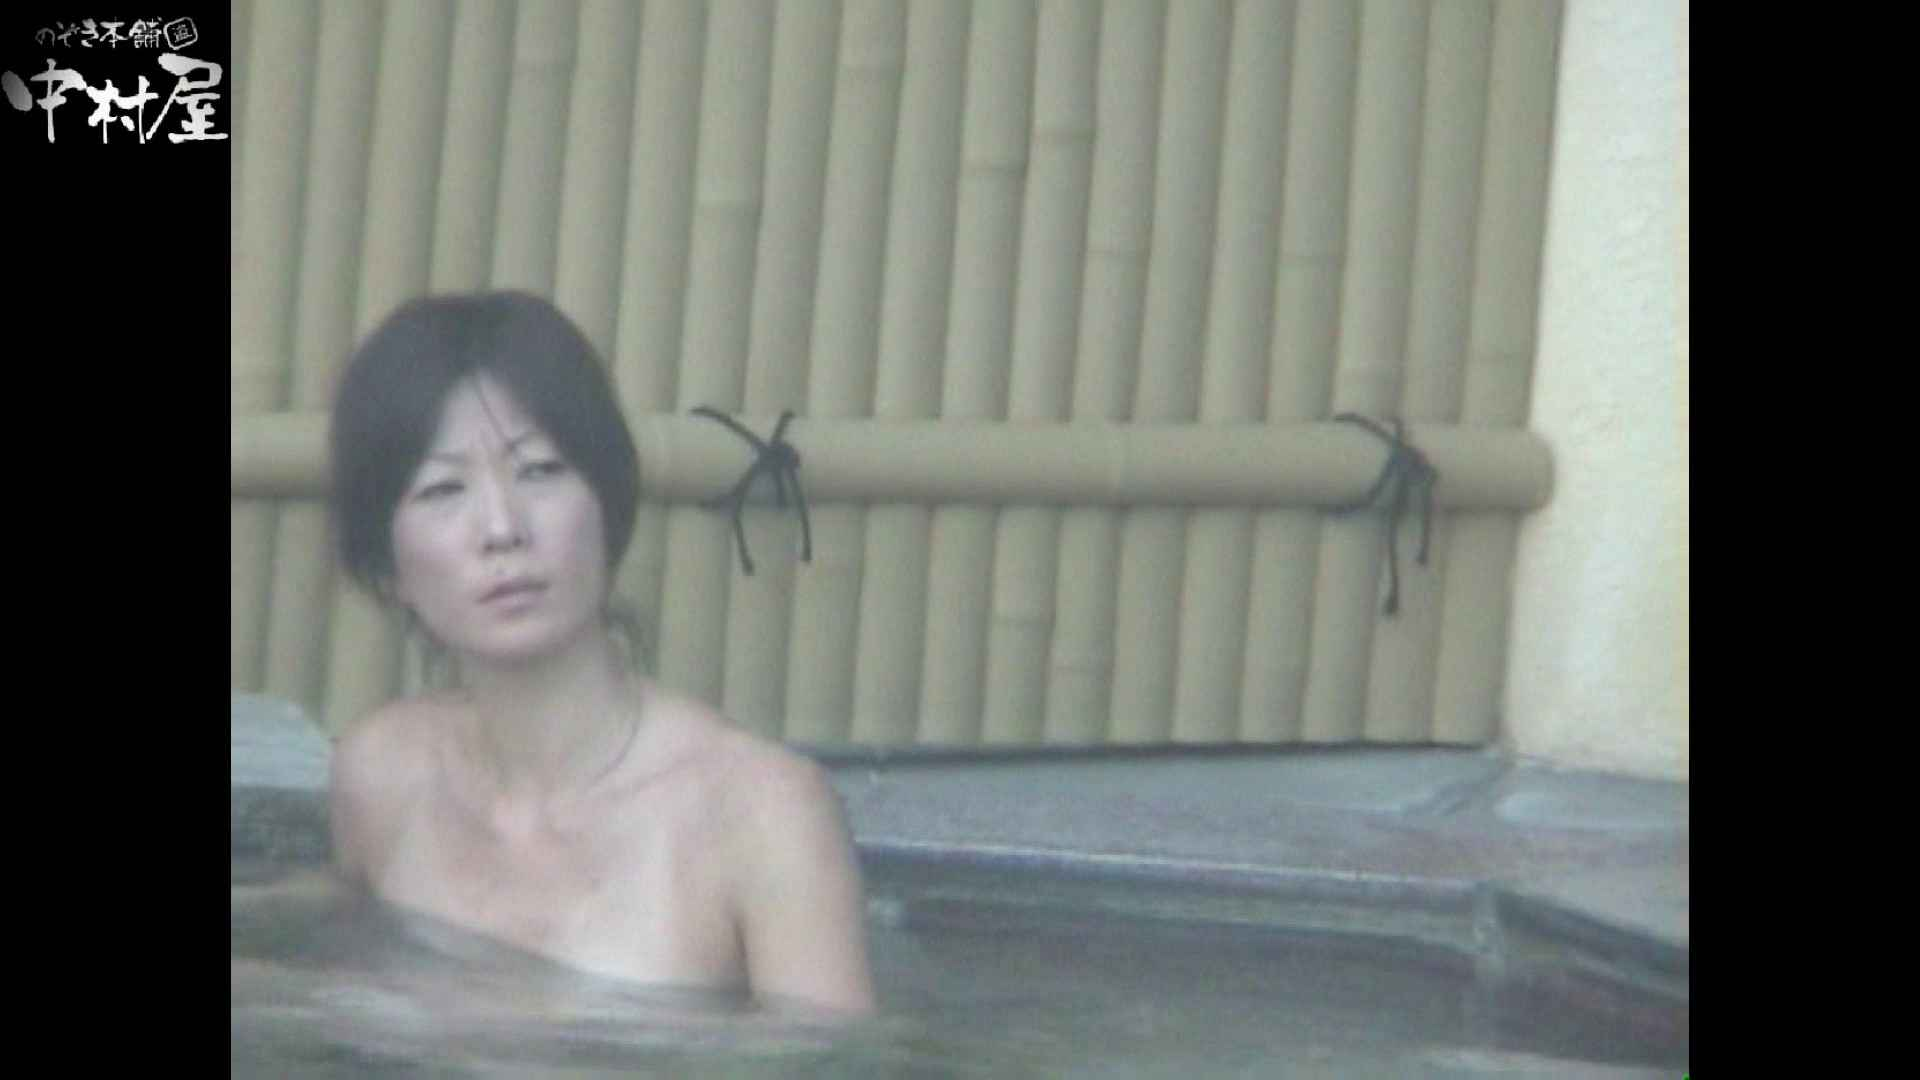 Aquaな露天風呂Vol.972 0  77連発 16